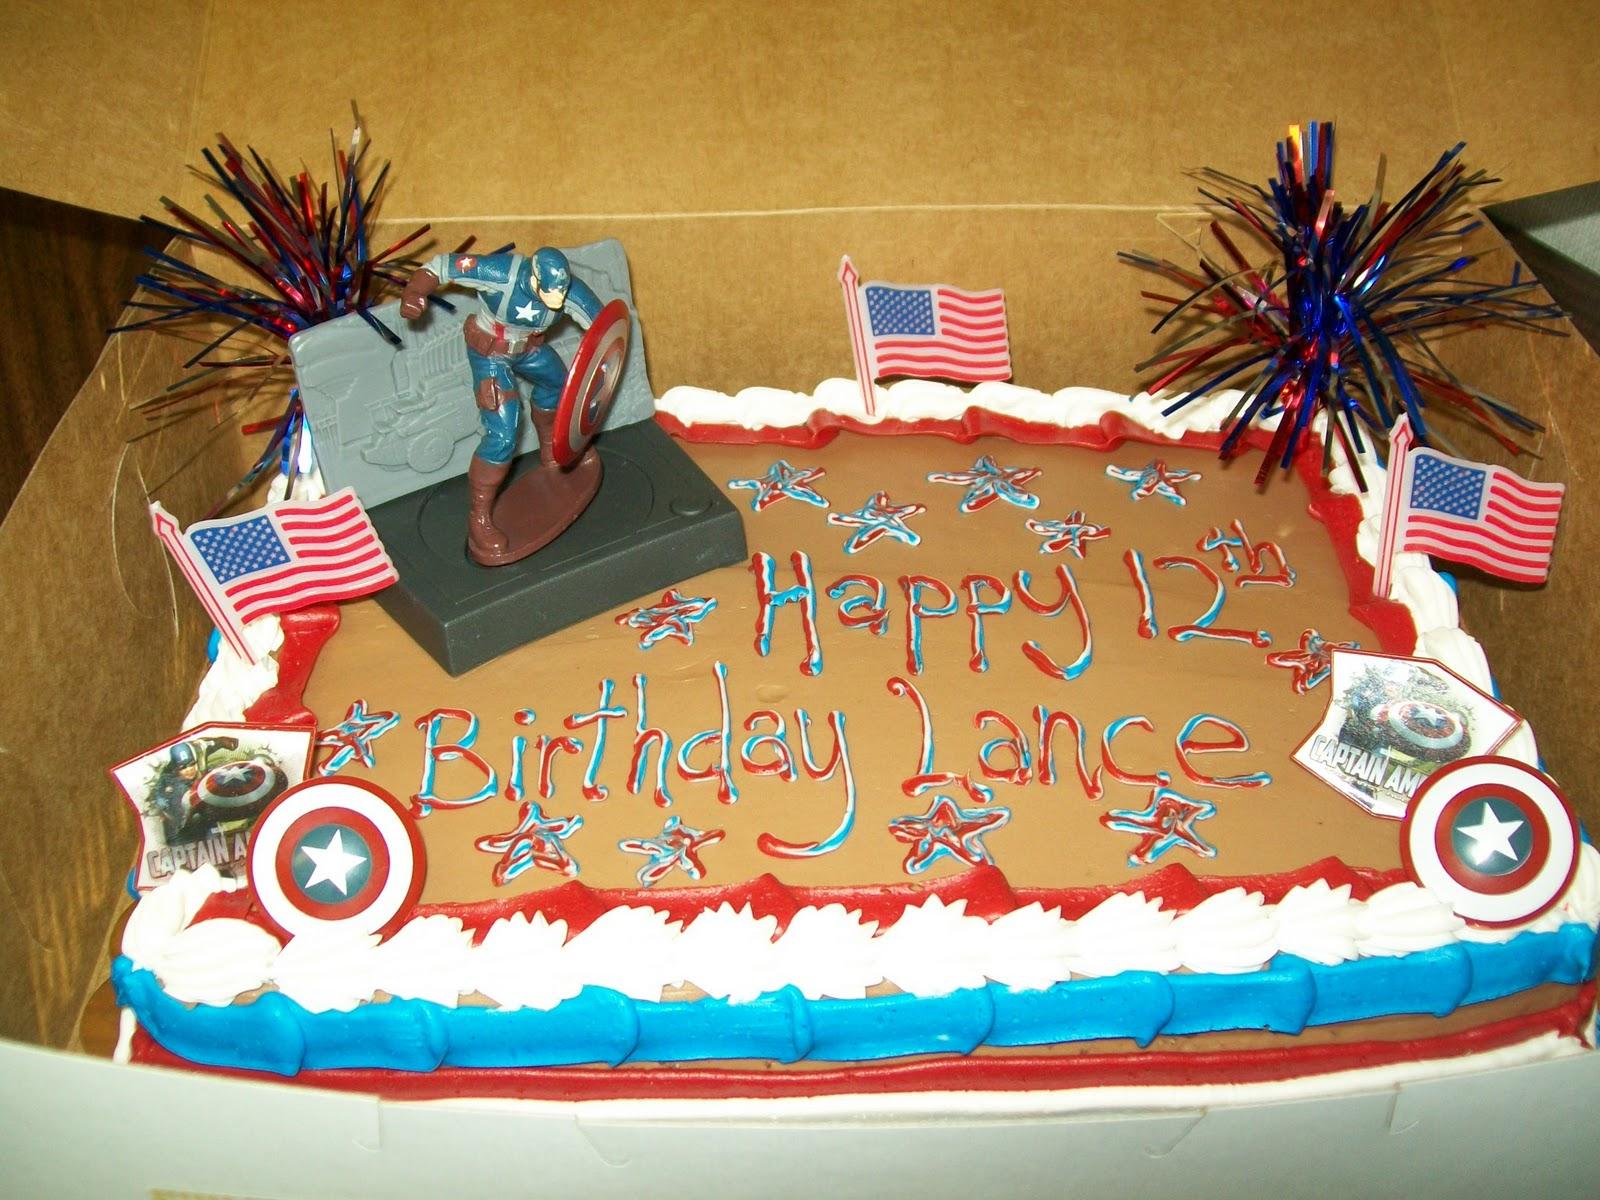 Pastel Lances Veterans Day 12th Birthday Cake